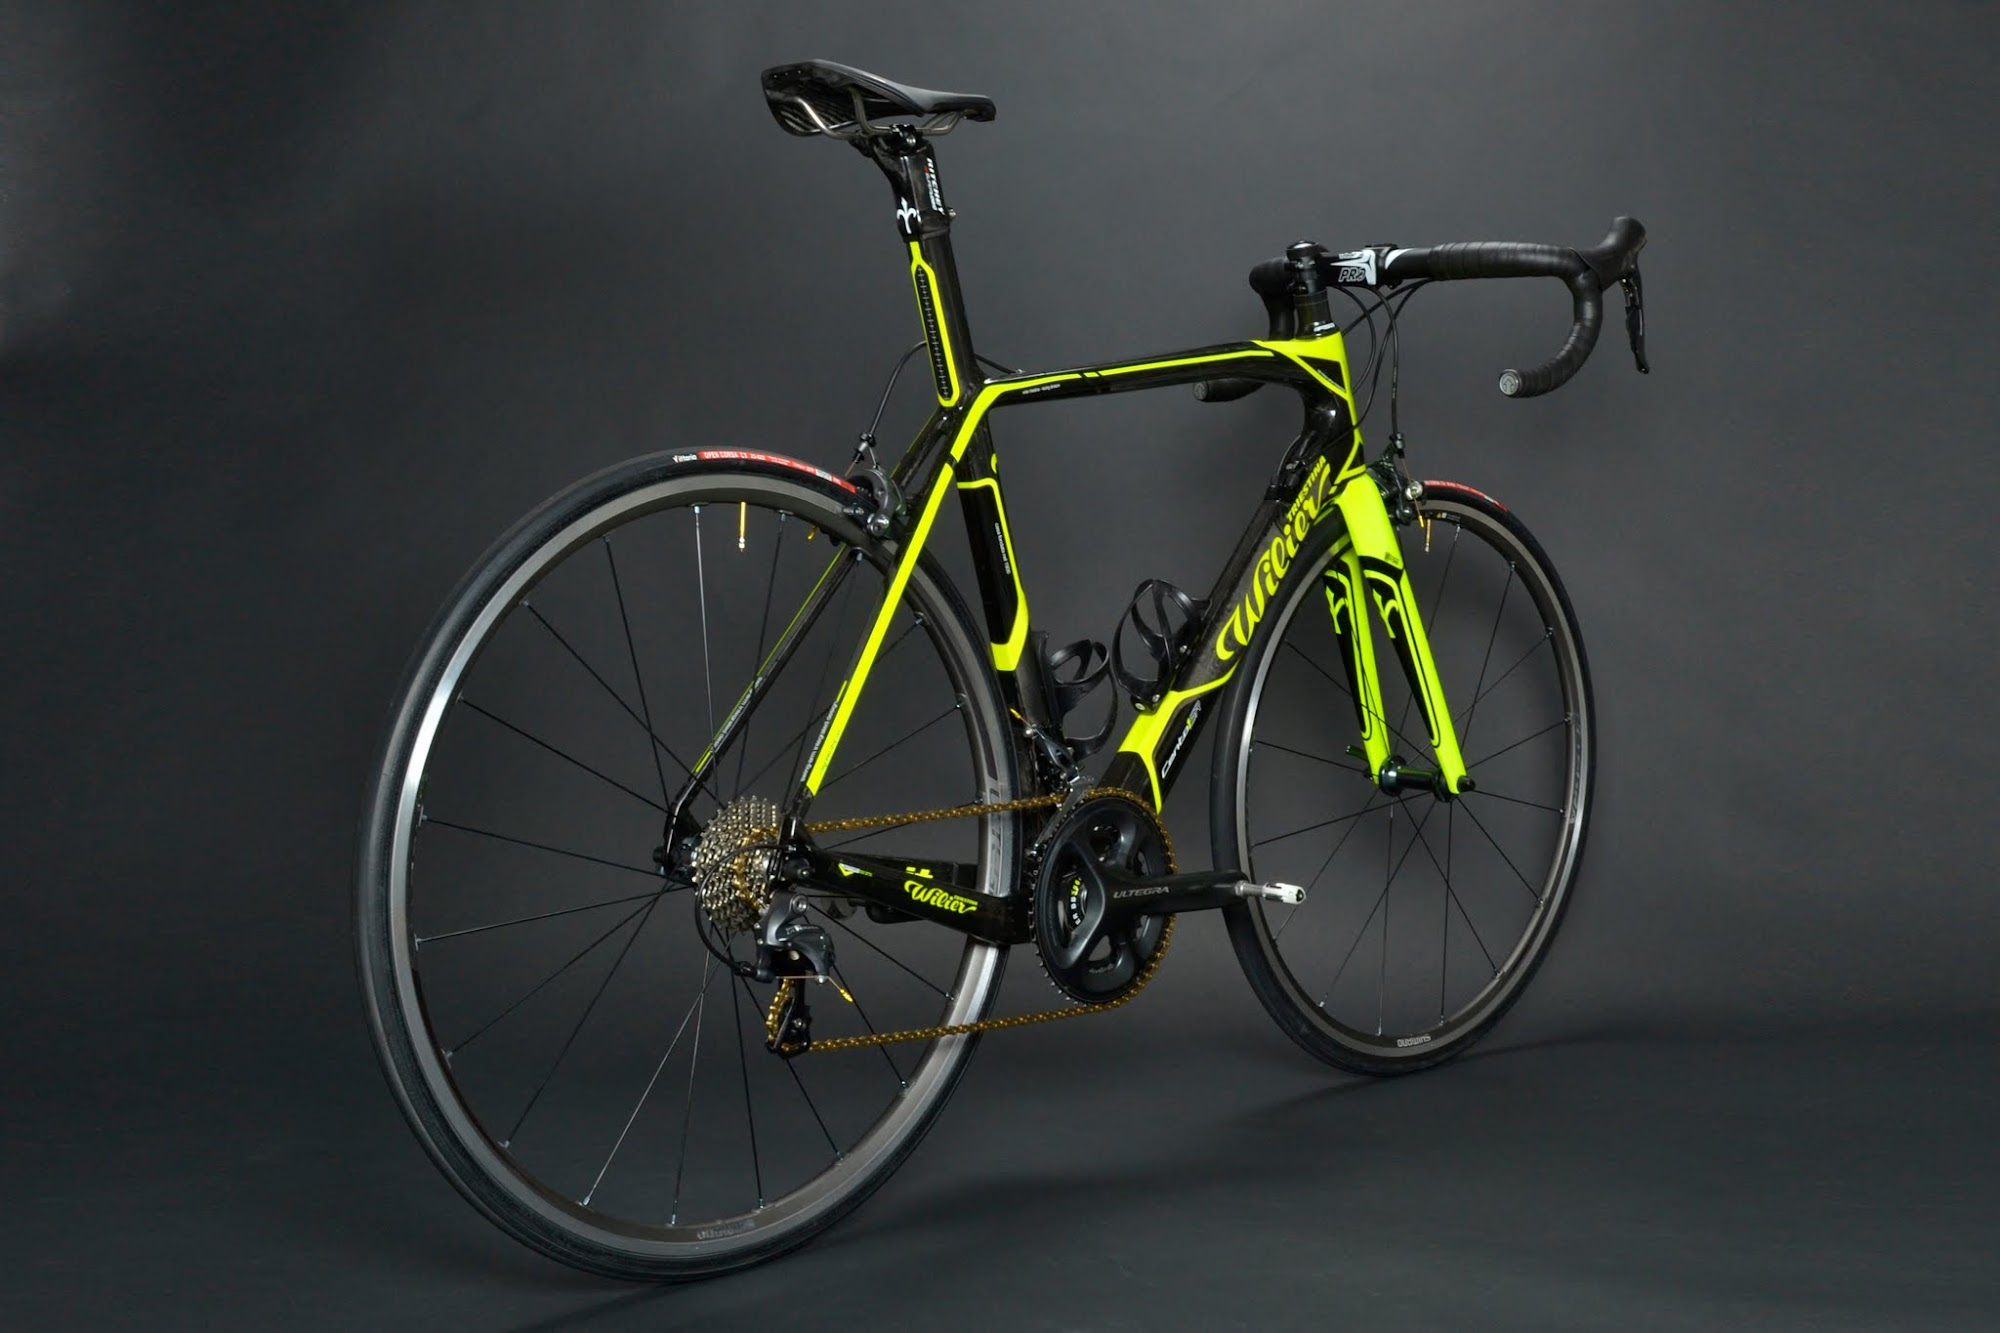 www.twohubs.com: Wilier Triestina Cento1 SR Shimano Ultegra 6800 Complete Bike at twohubs.com